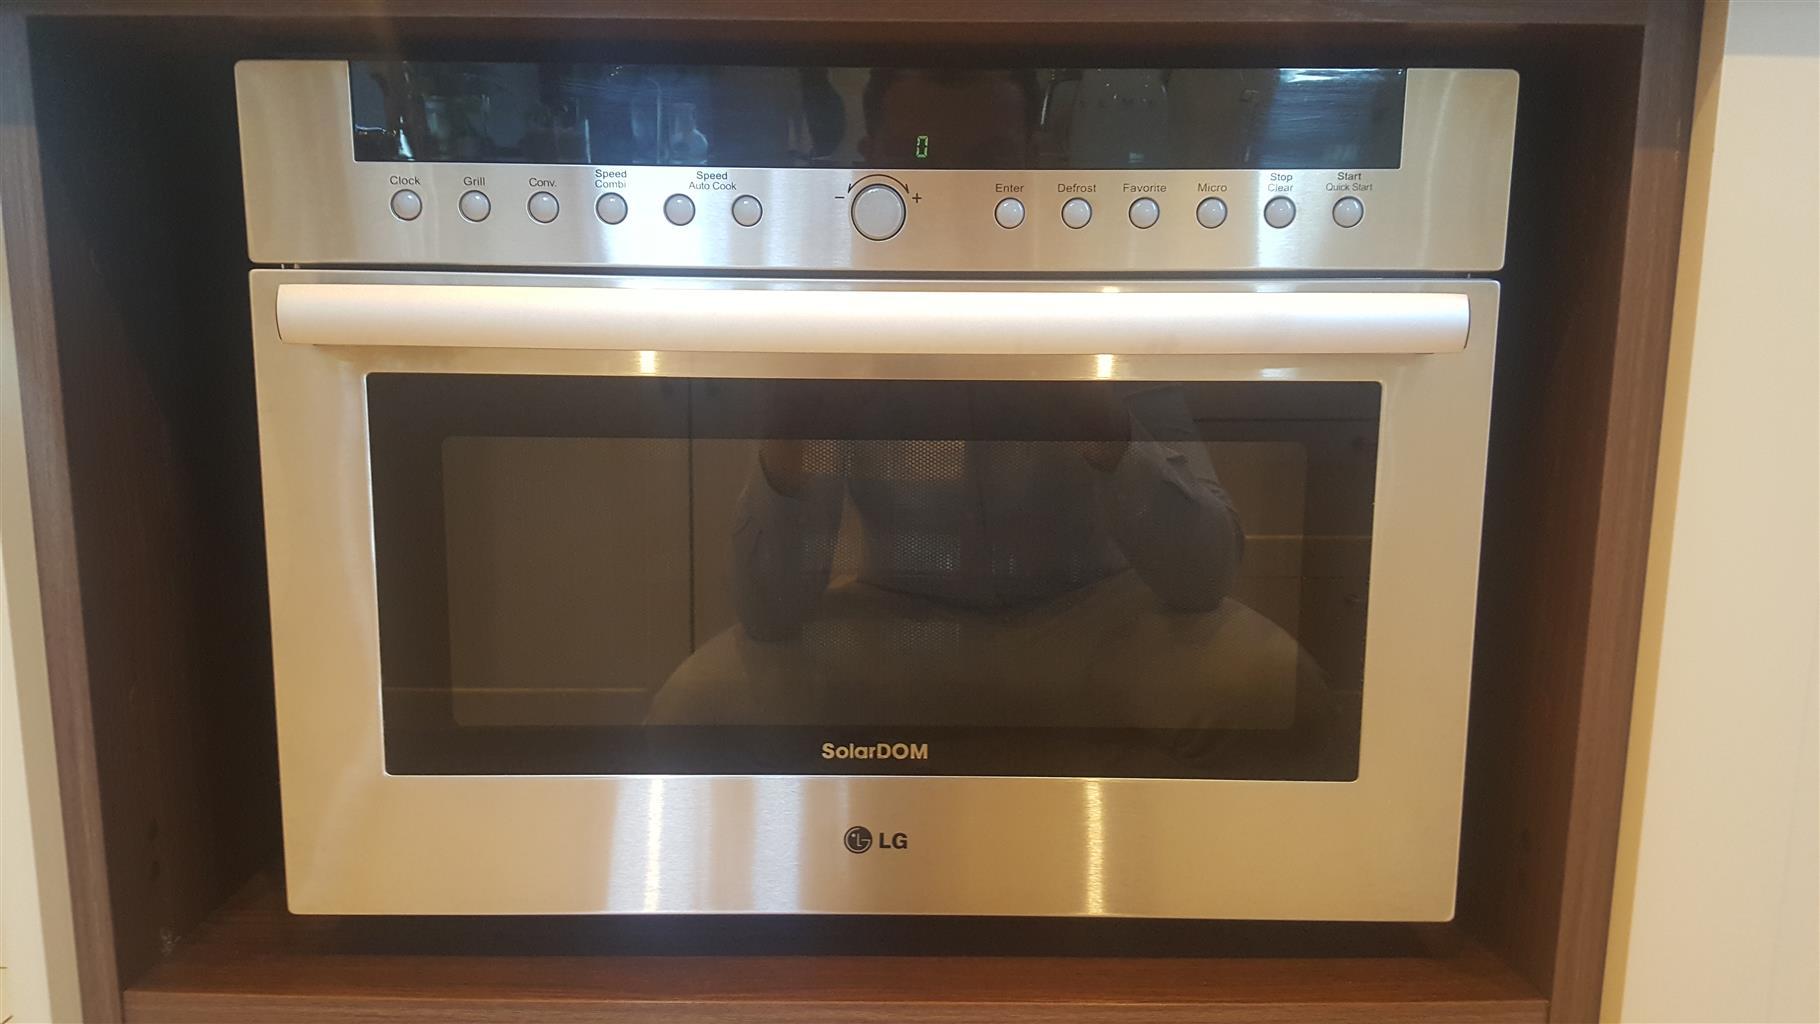 38L Solardom Microwave Oven